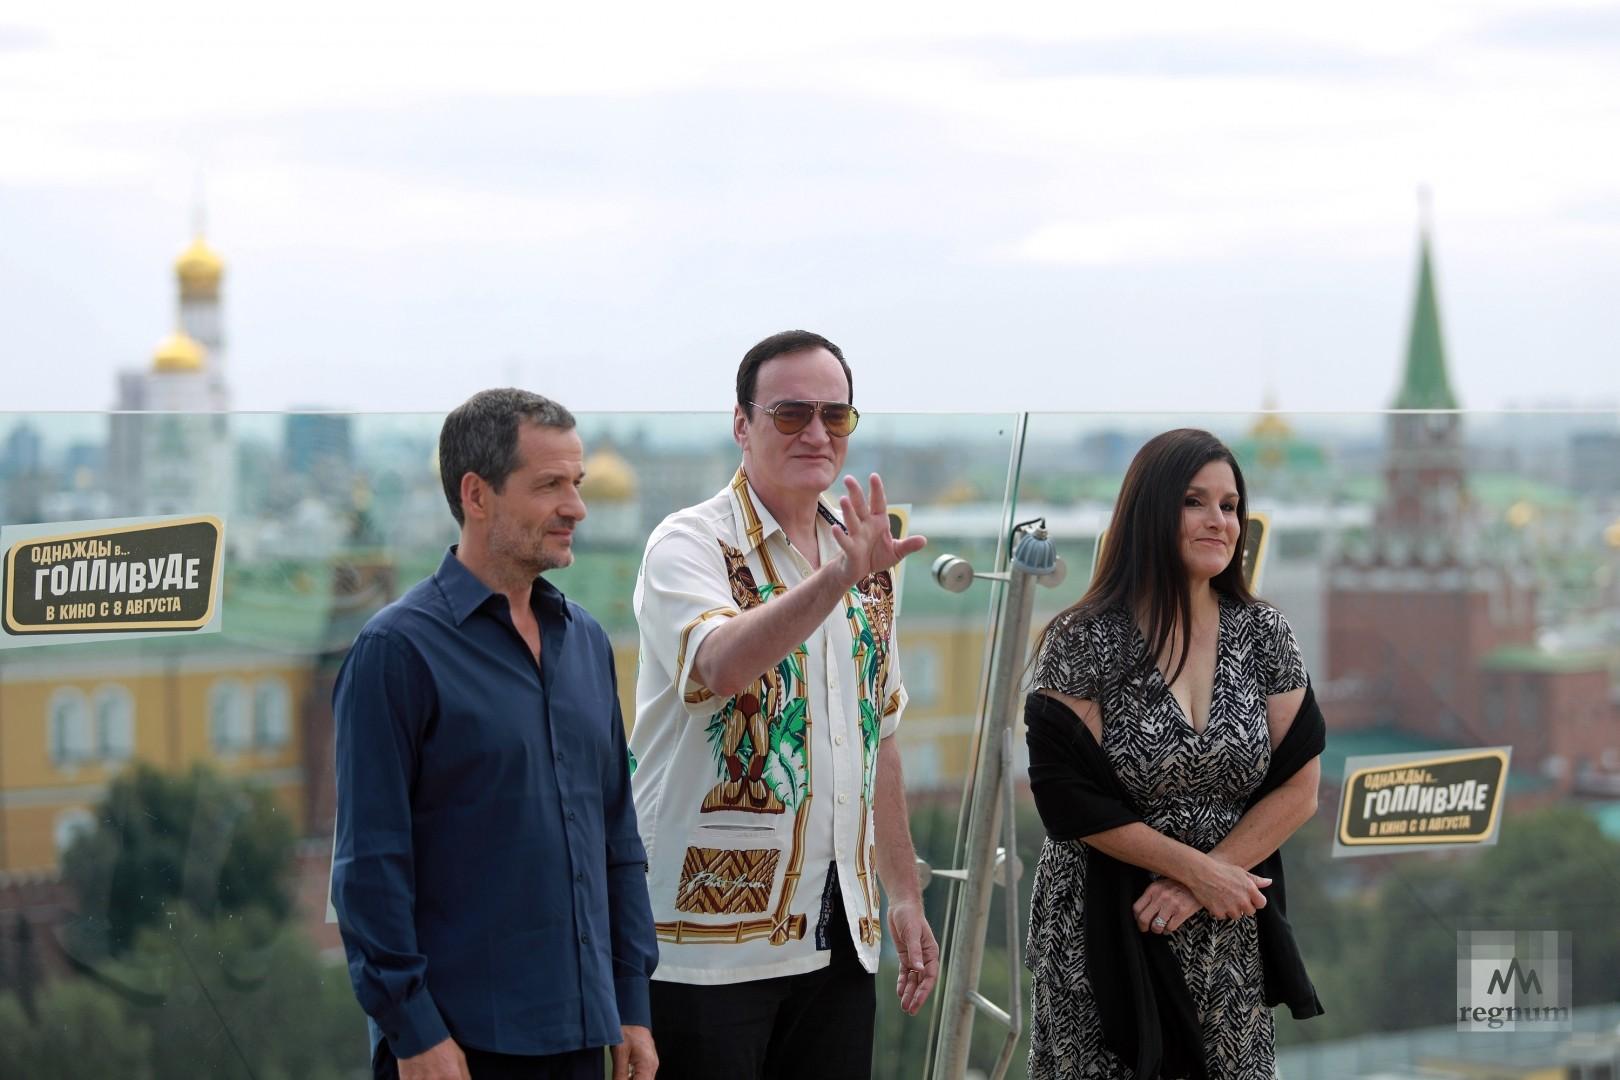 Продюсер Дэвид Хейман, режиссер Квентин Тарантино и продюсер Шеннон МакИнтош (слева направо)